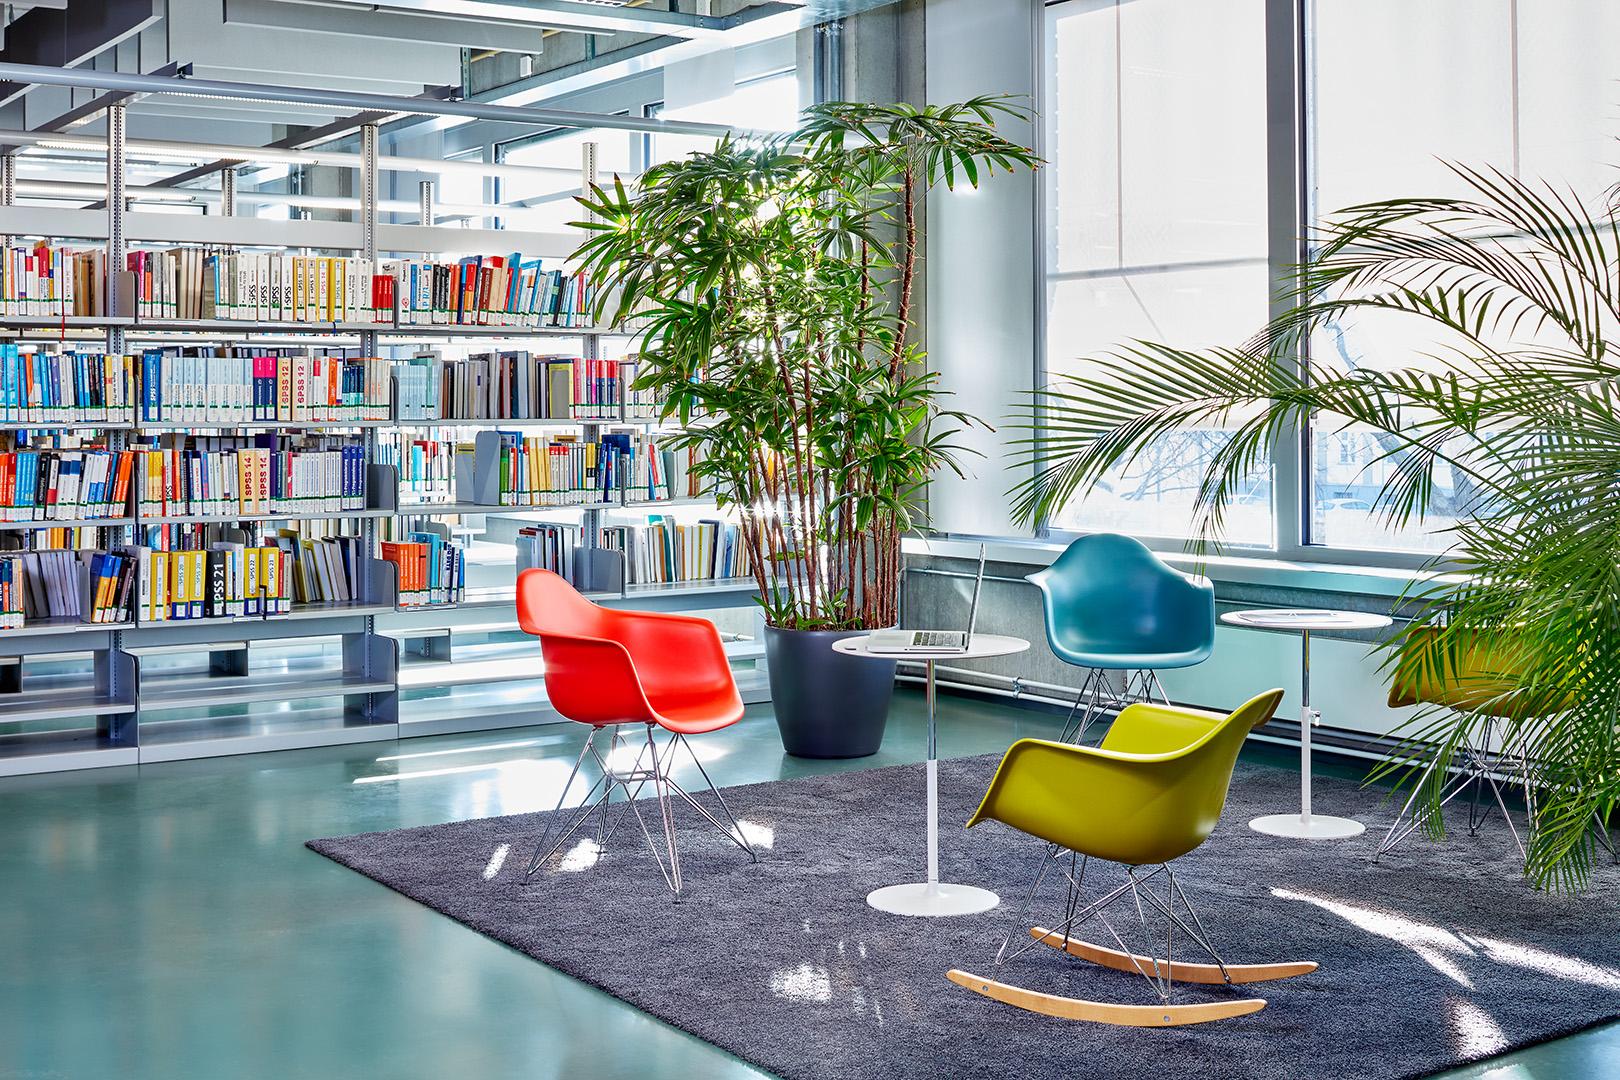 vitra_Uni_Library_Berlin_web_05